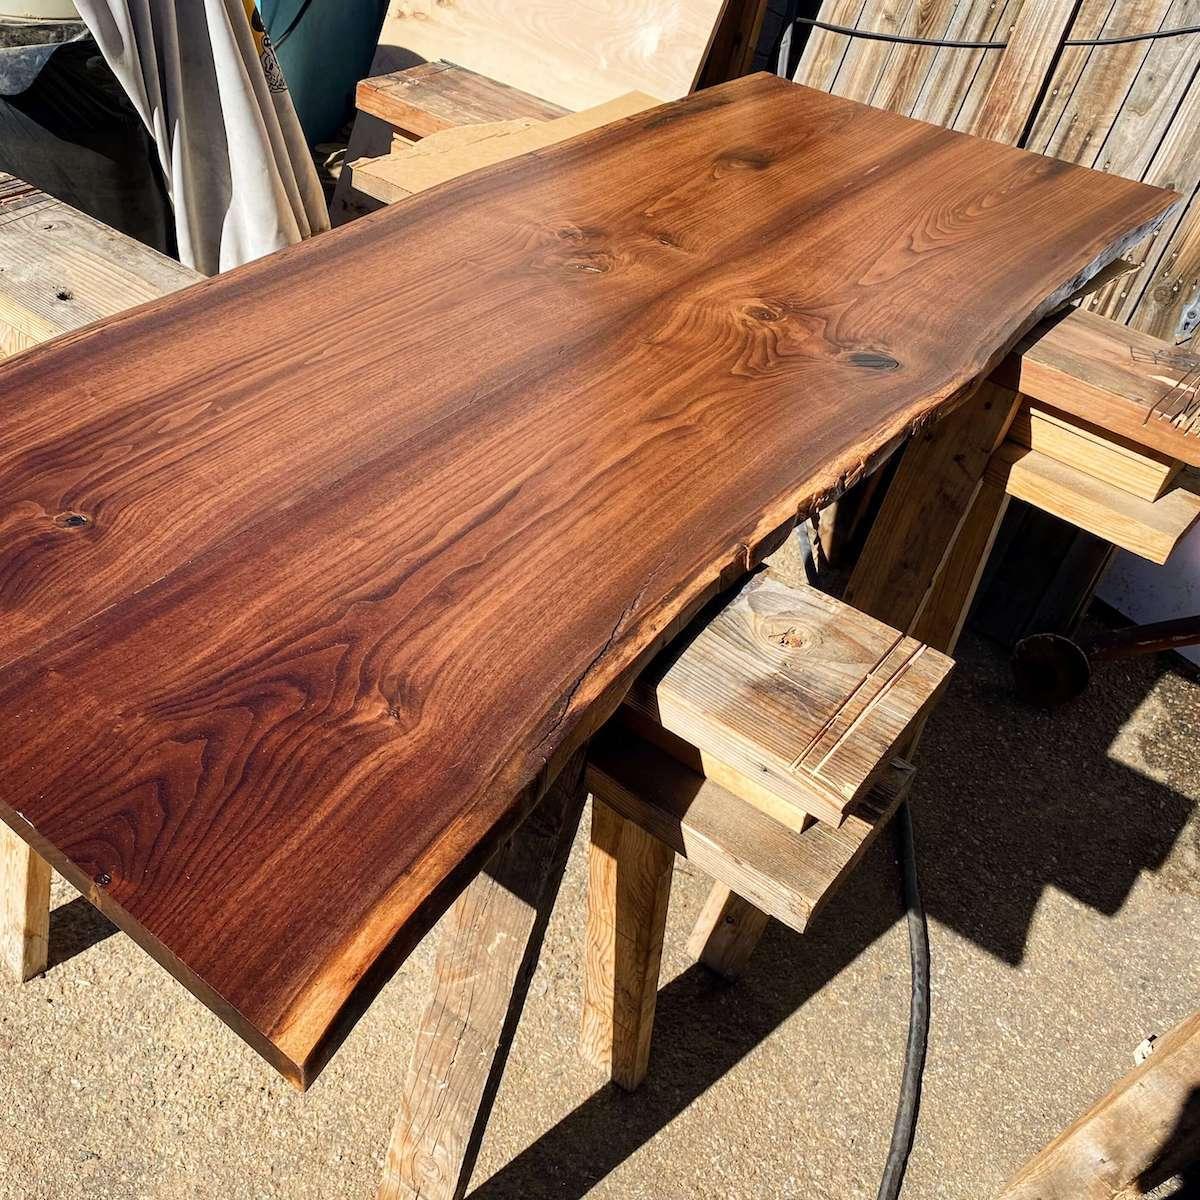 Black walnut live edge countertop